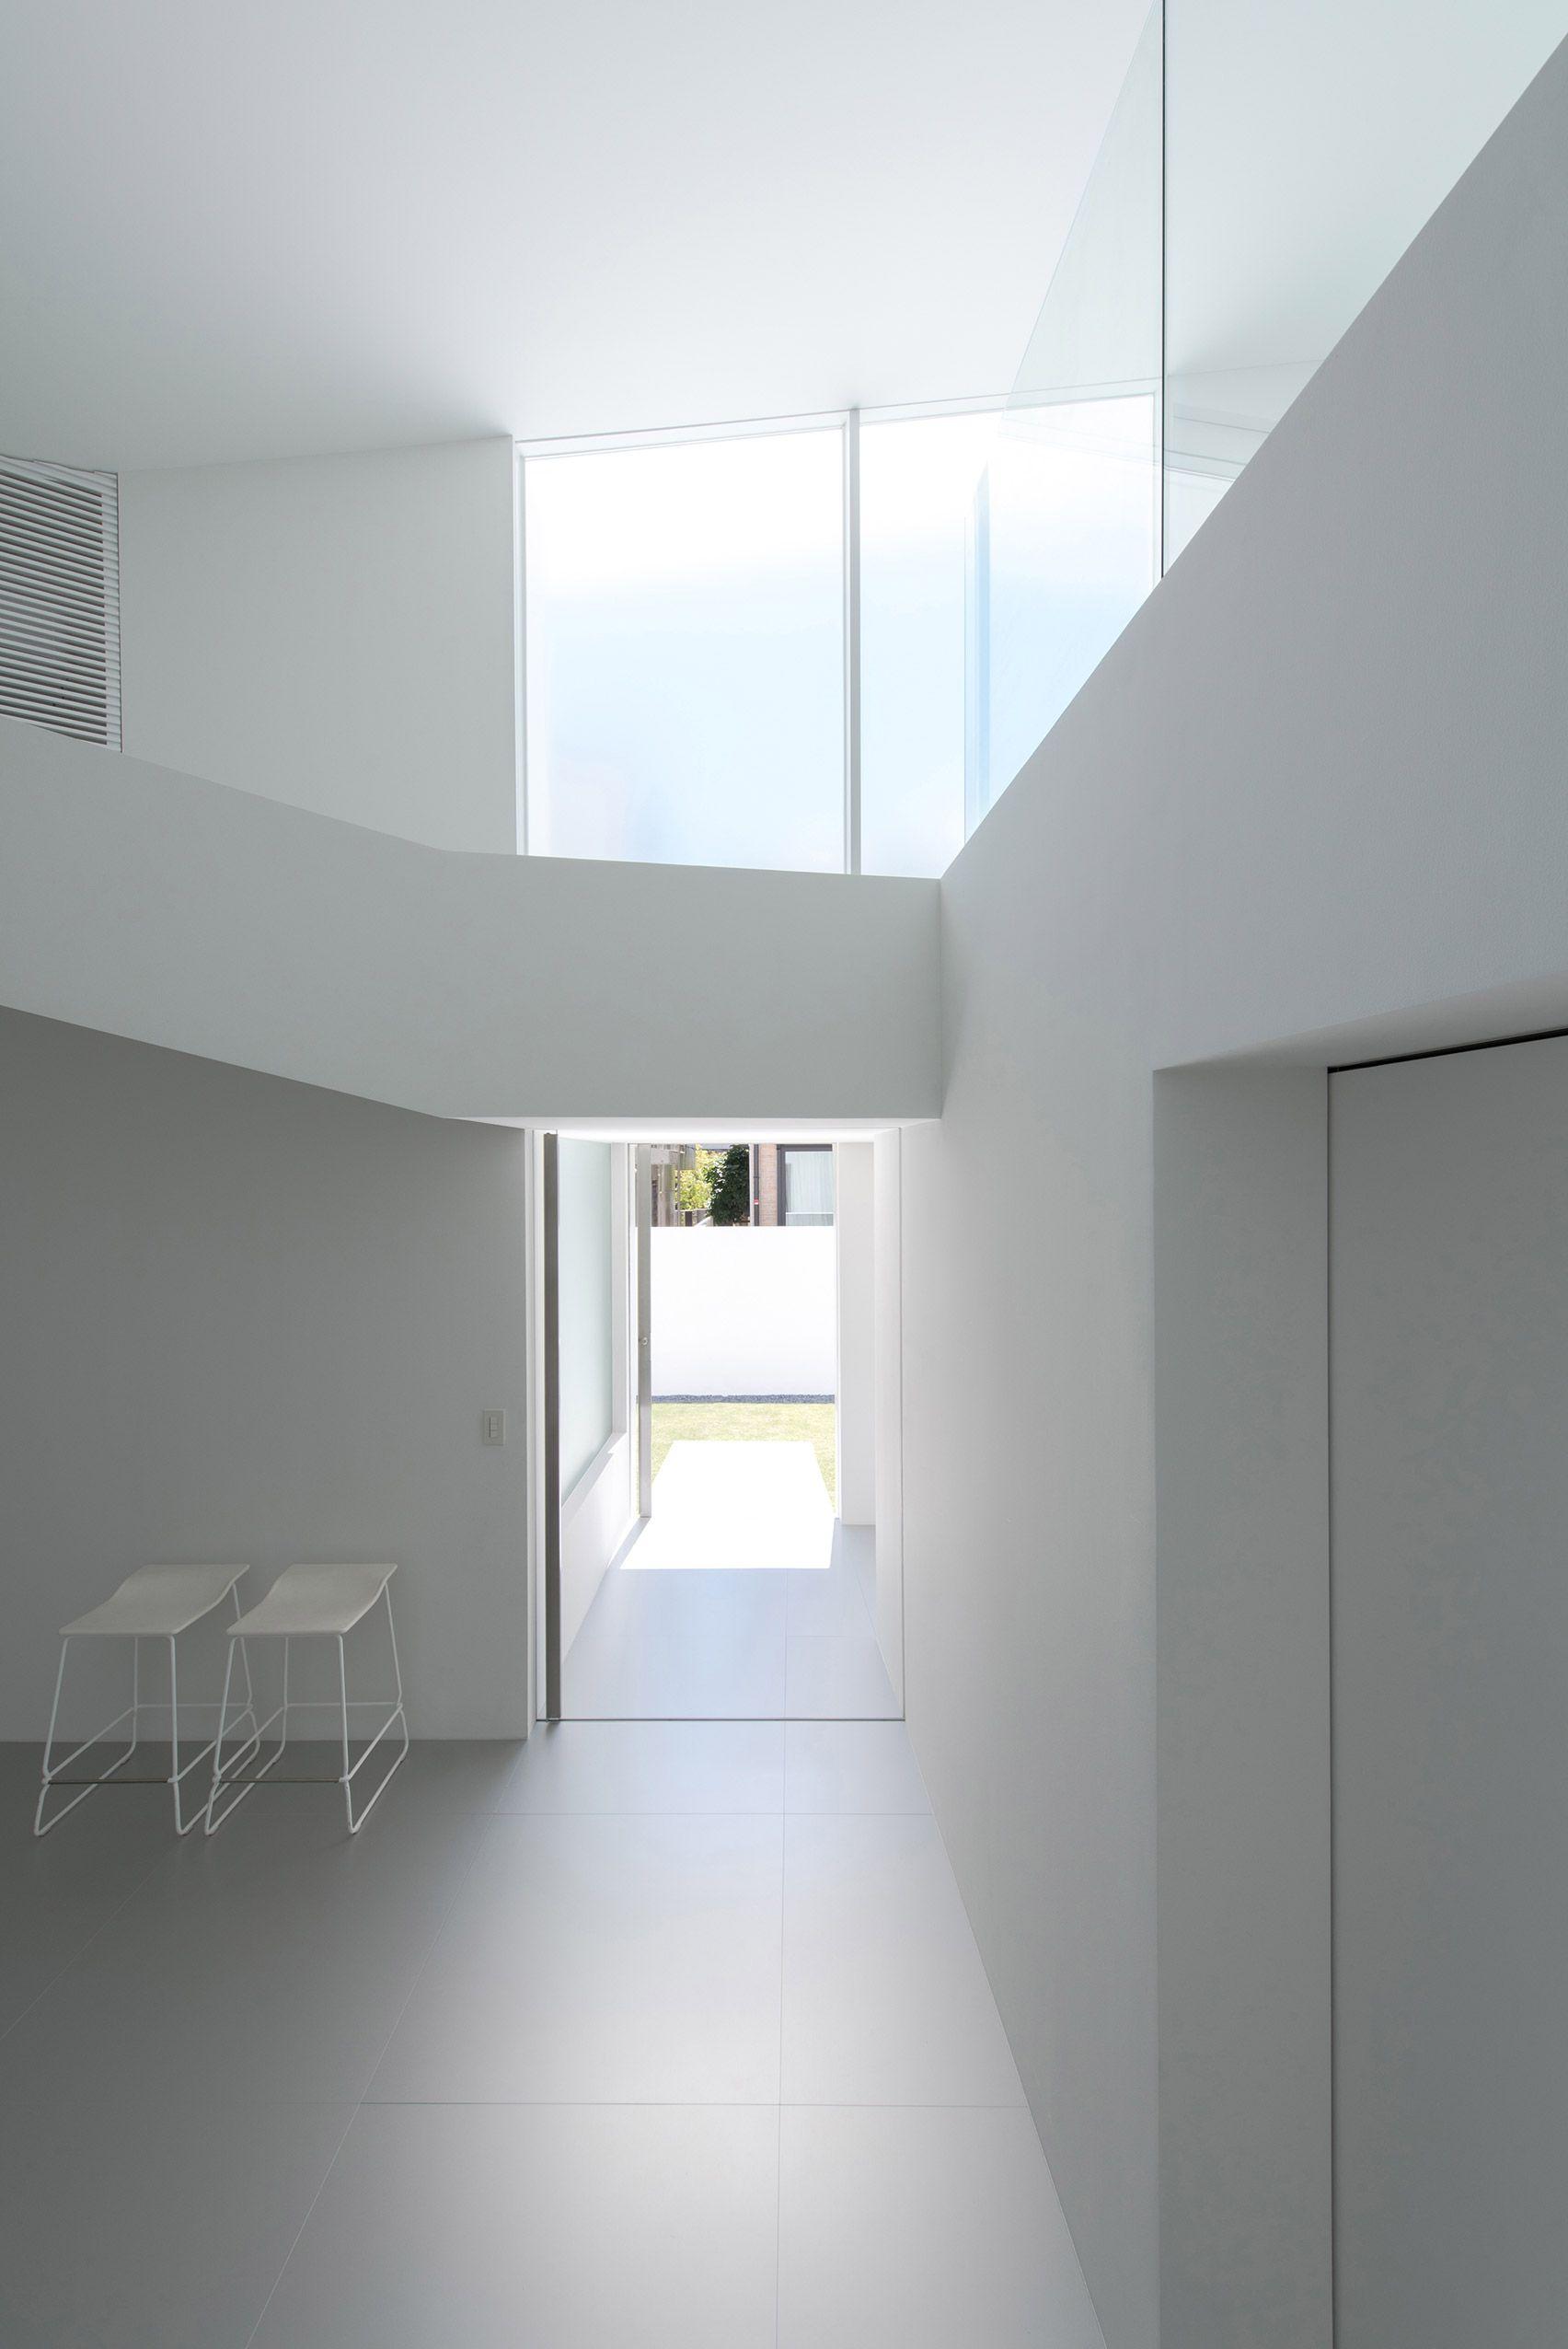 Takashi Yamaguchi Designs House In Japan Based On A Möbius